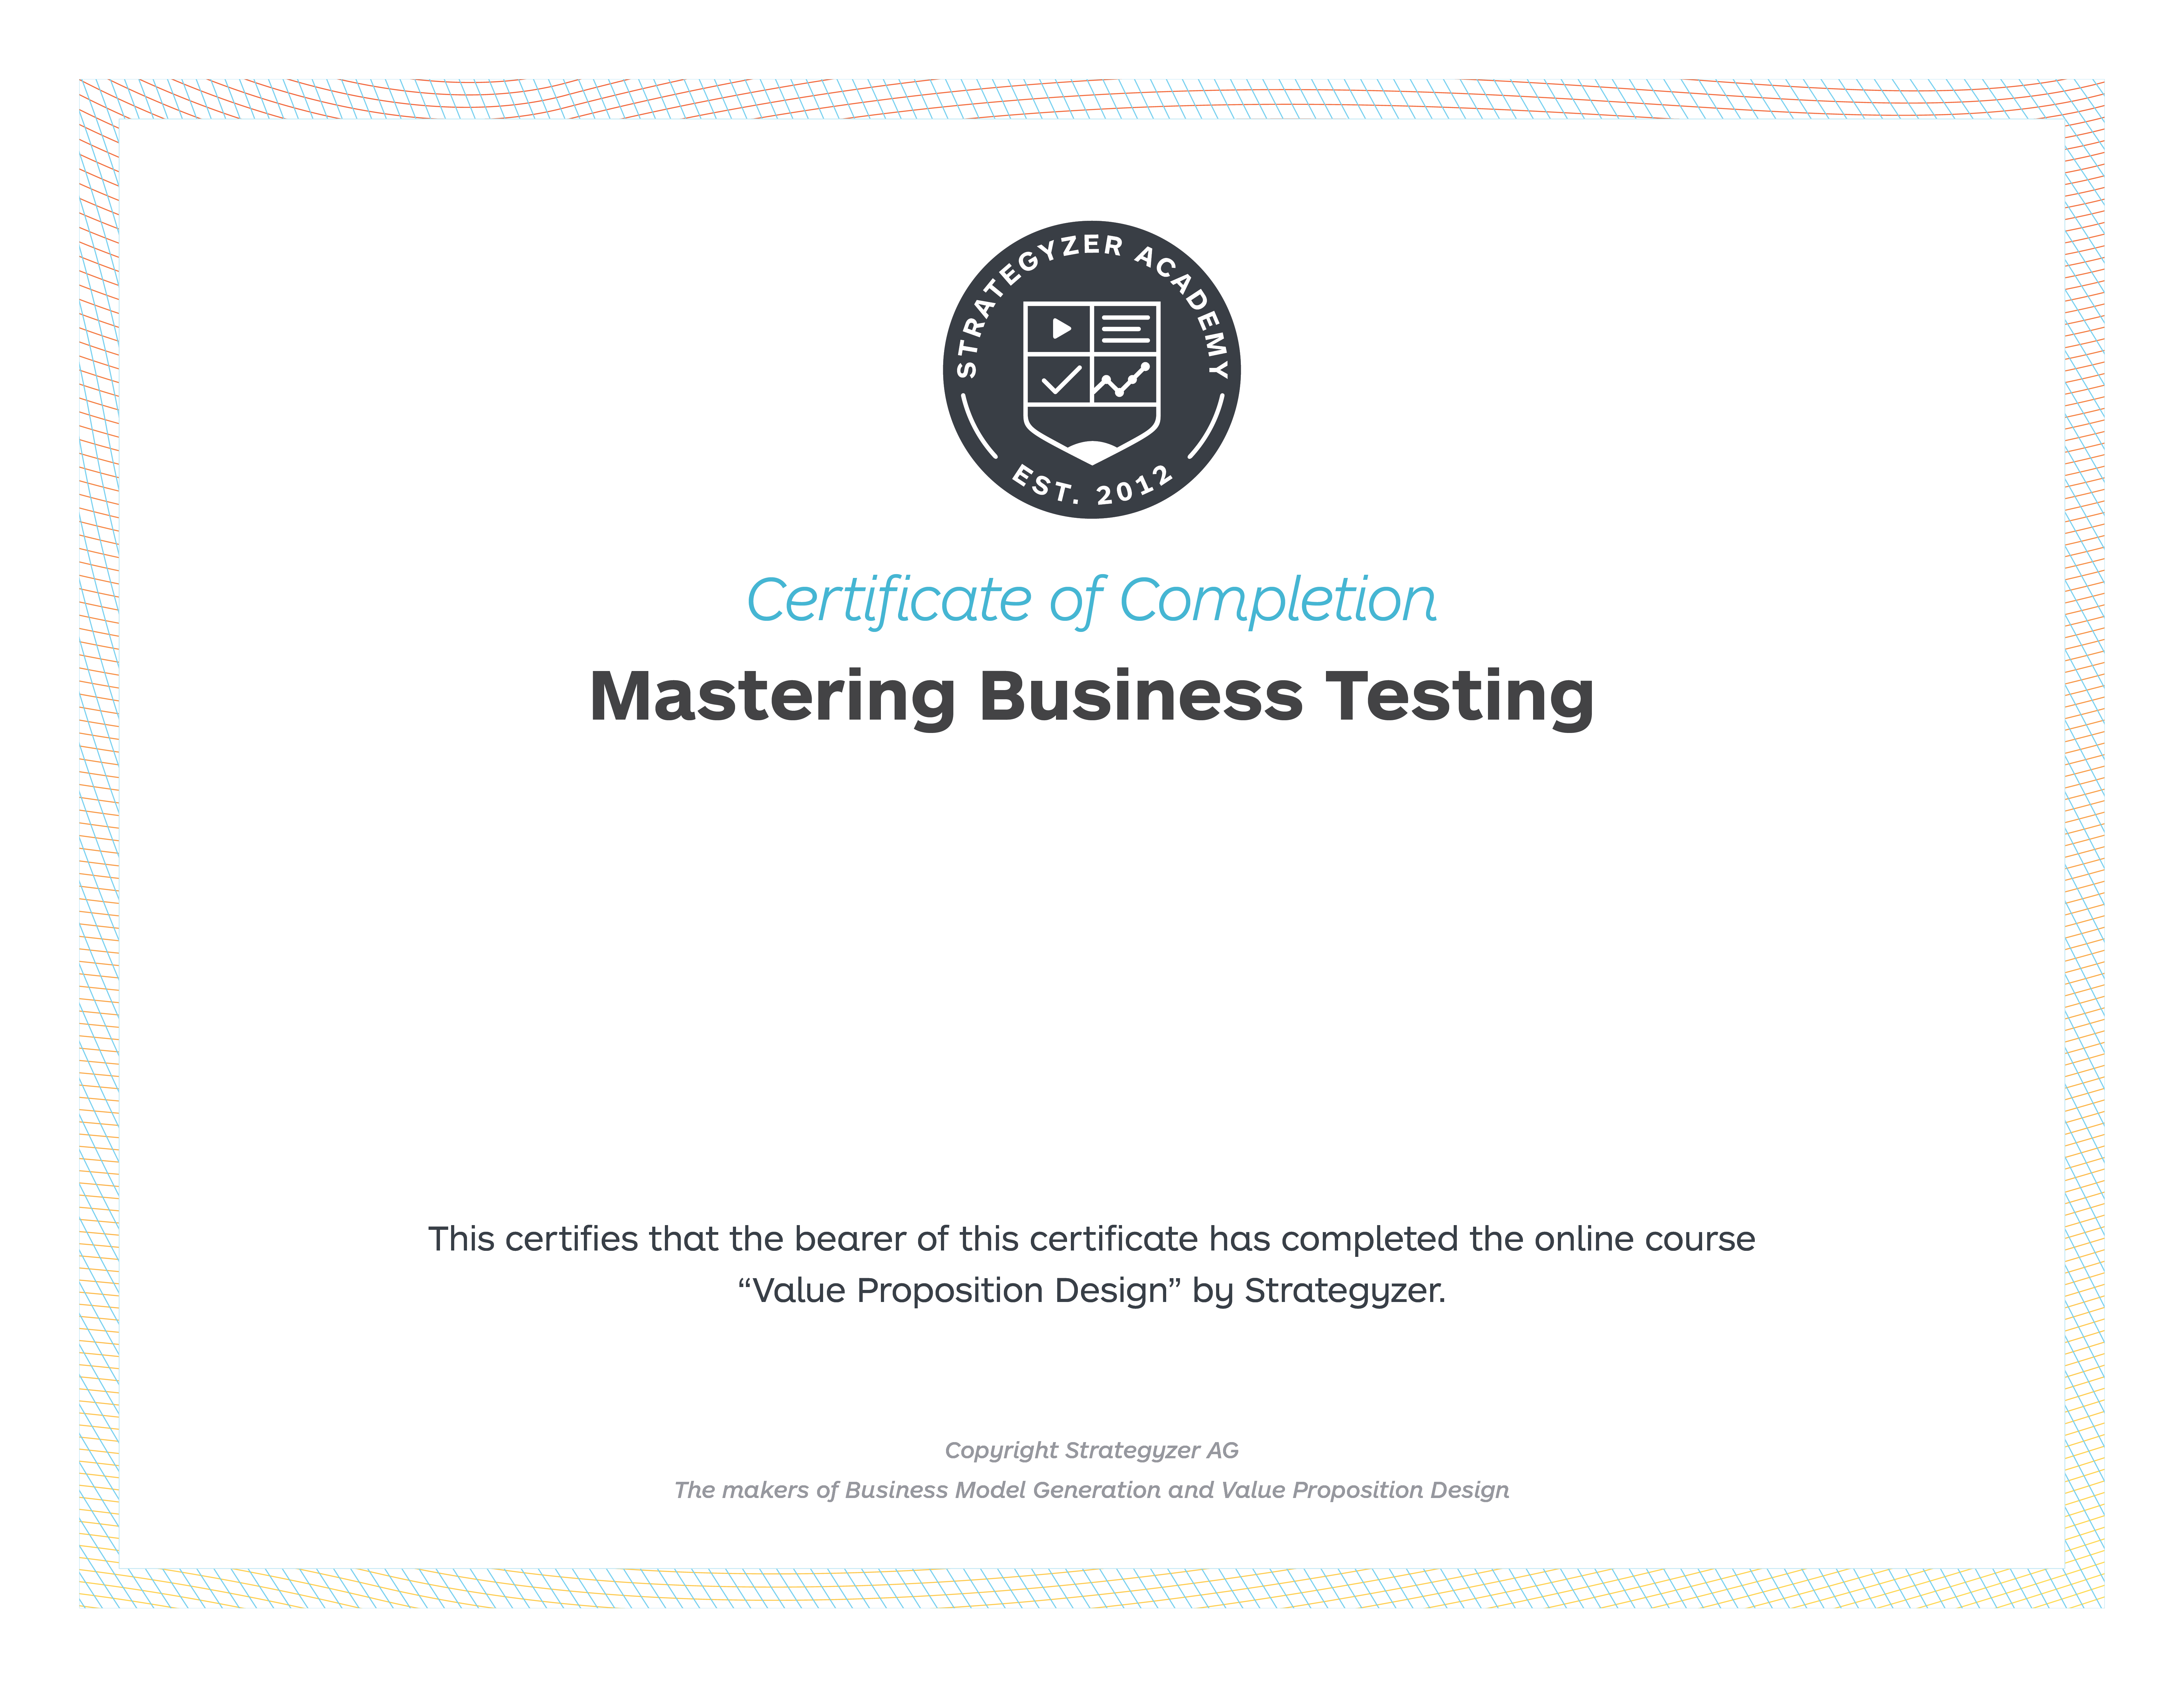 mbt-certificate